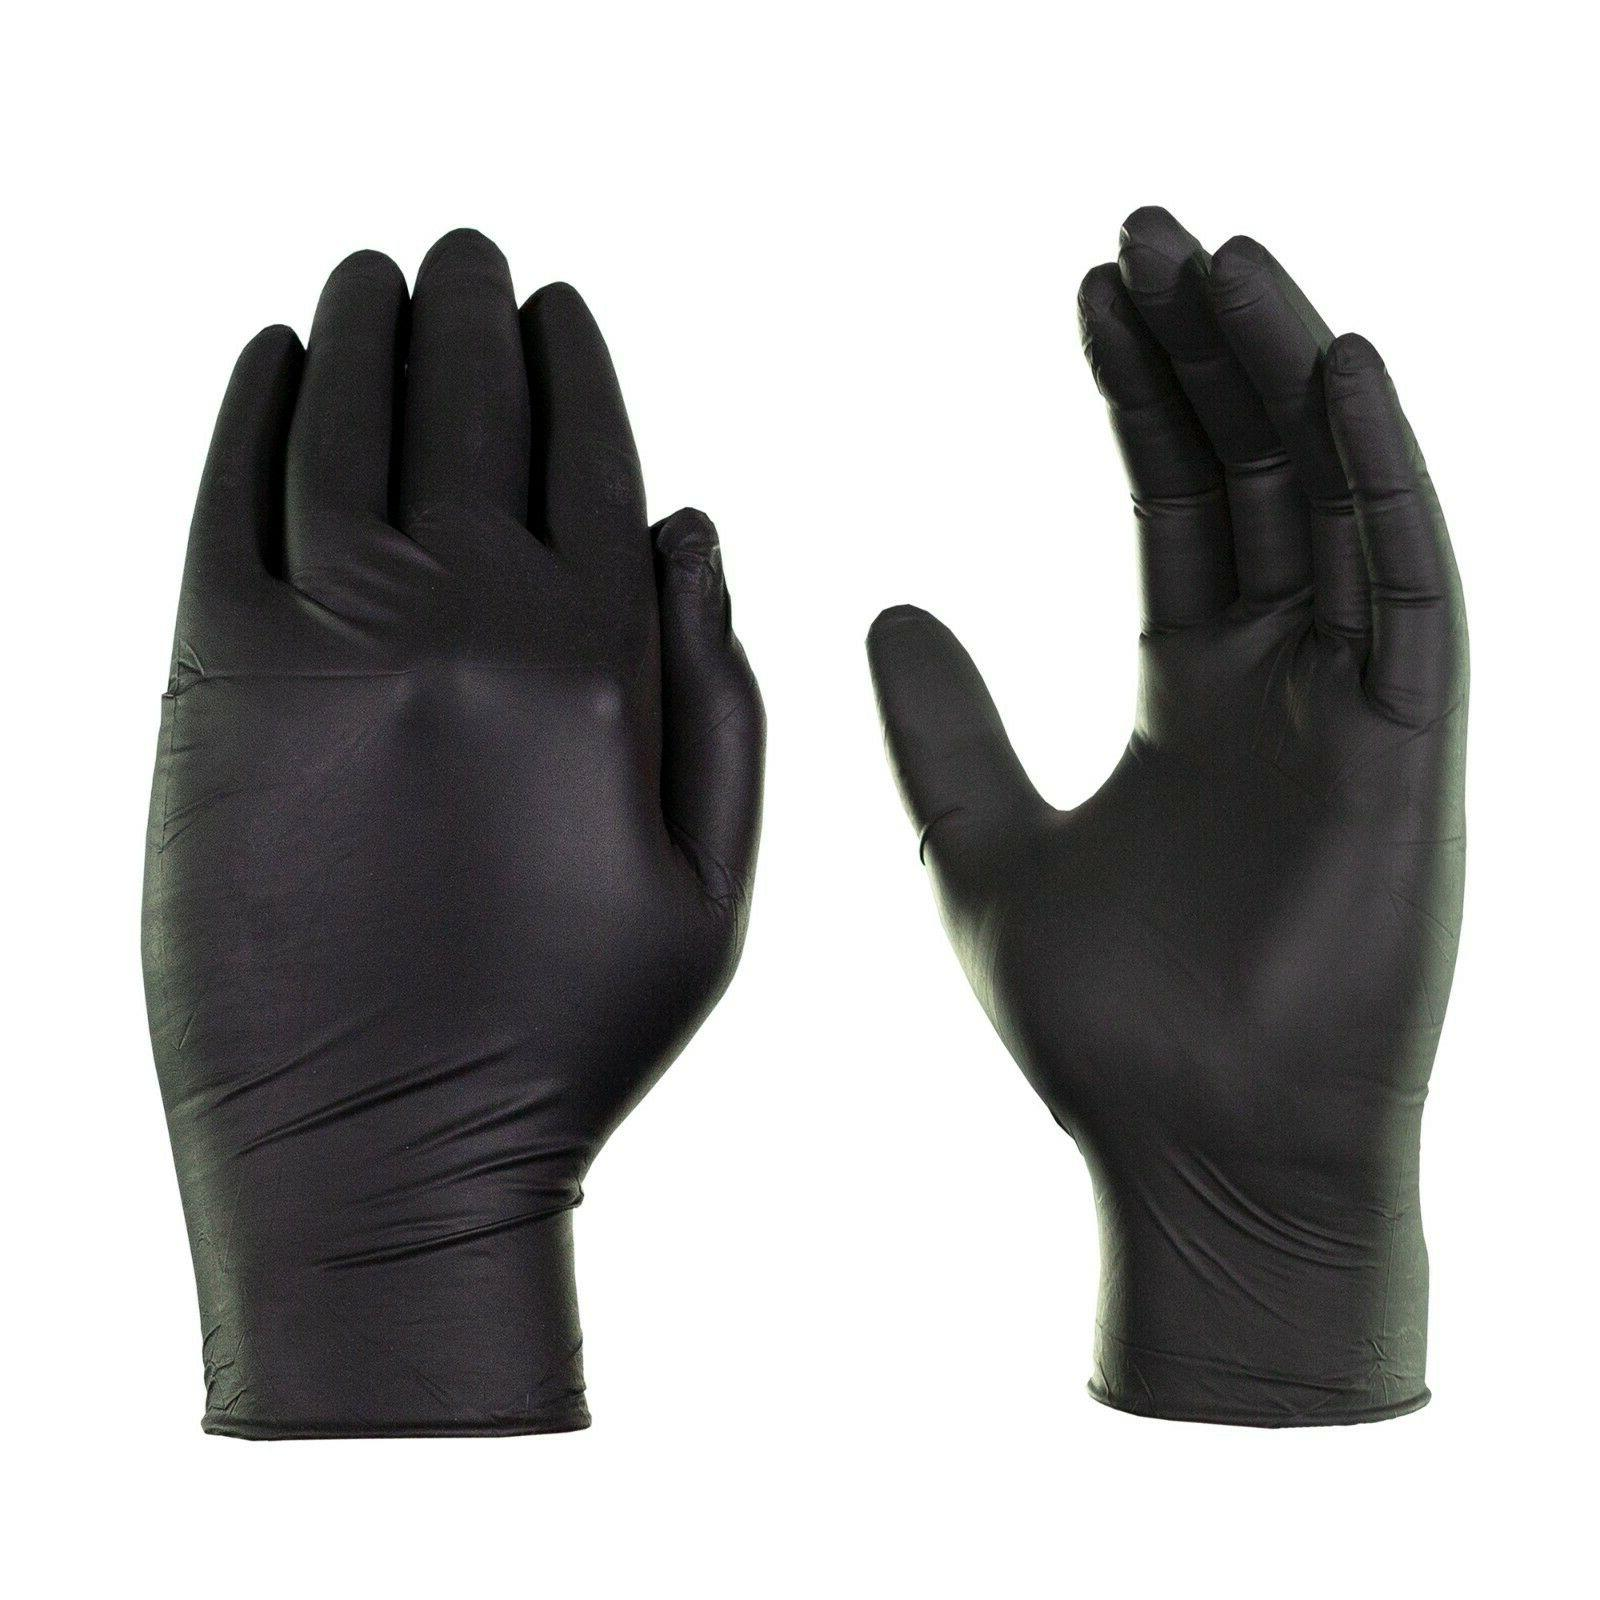 1000/Case Disposable Powder-Free Nitrile Medical Gloves